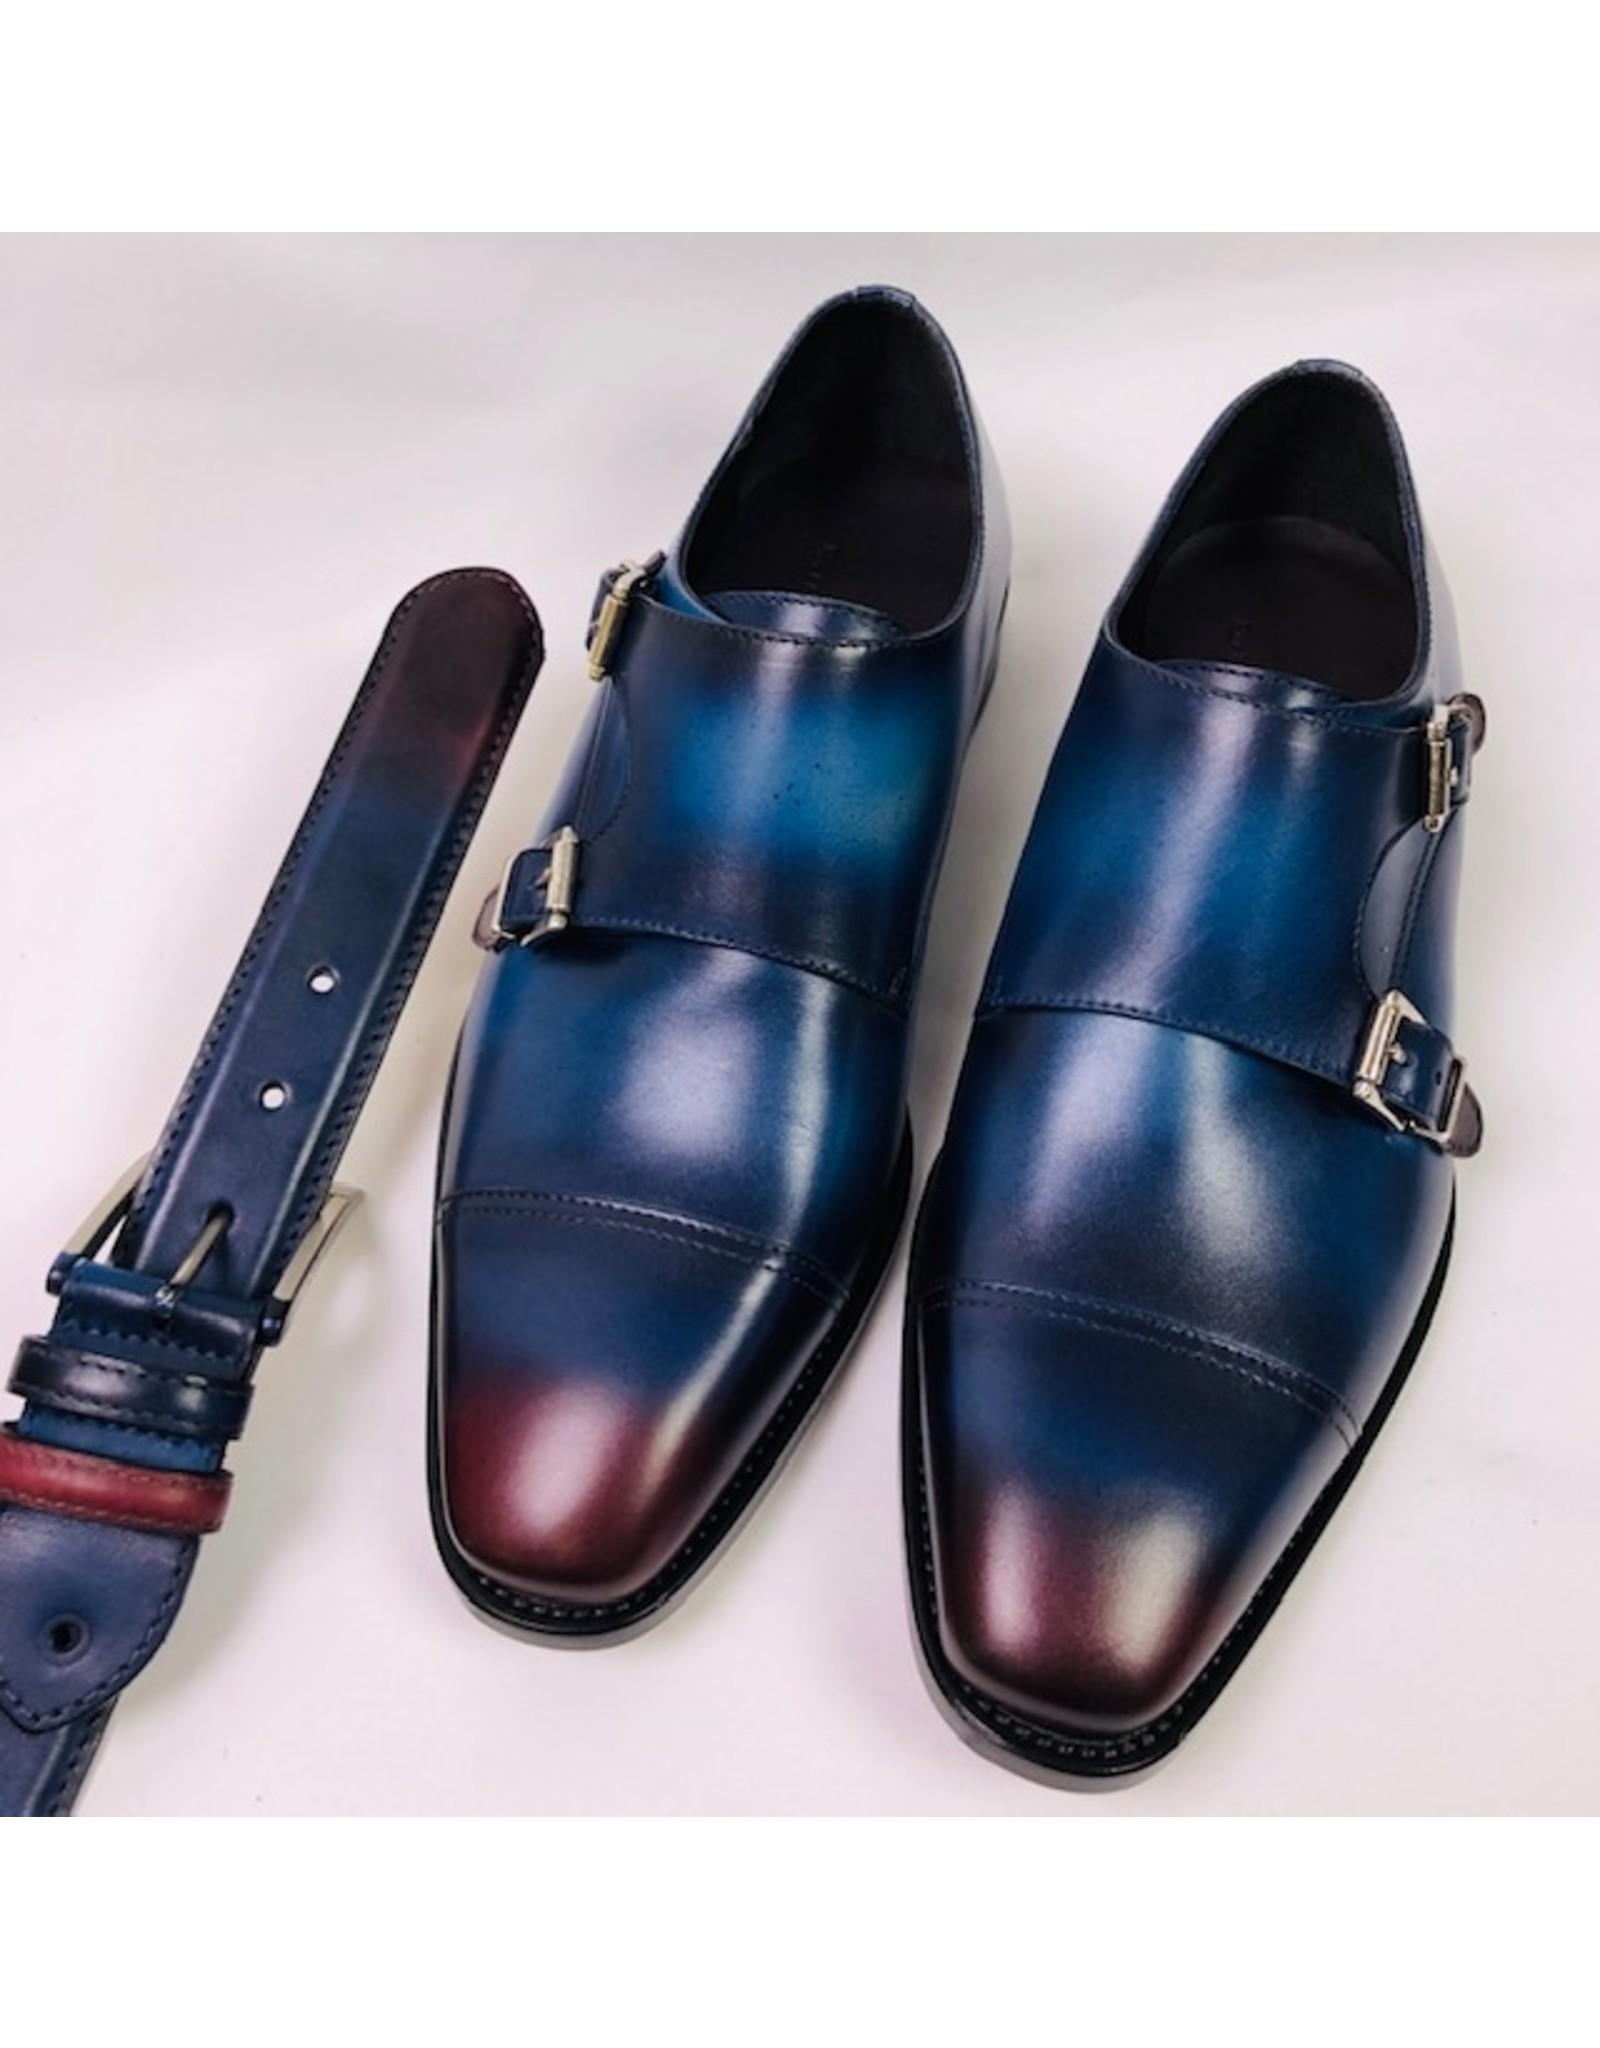 Roel Berkelmans Dubbele gesp brede leest kleur blauw/bordo zool leder/tpu